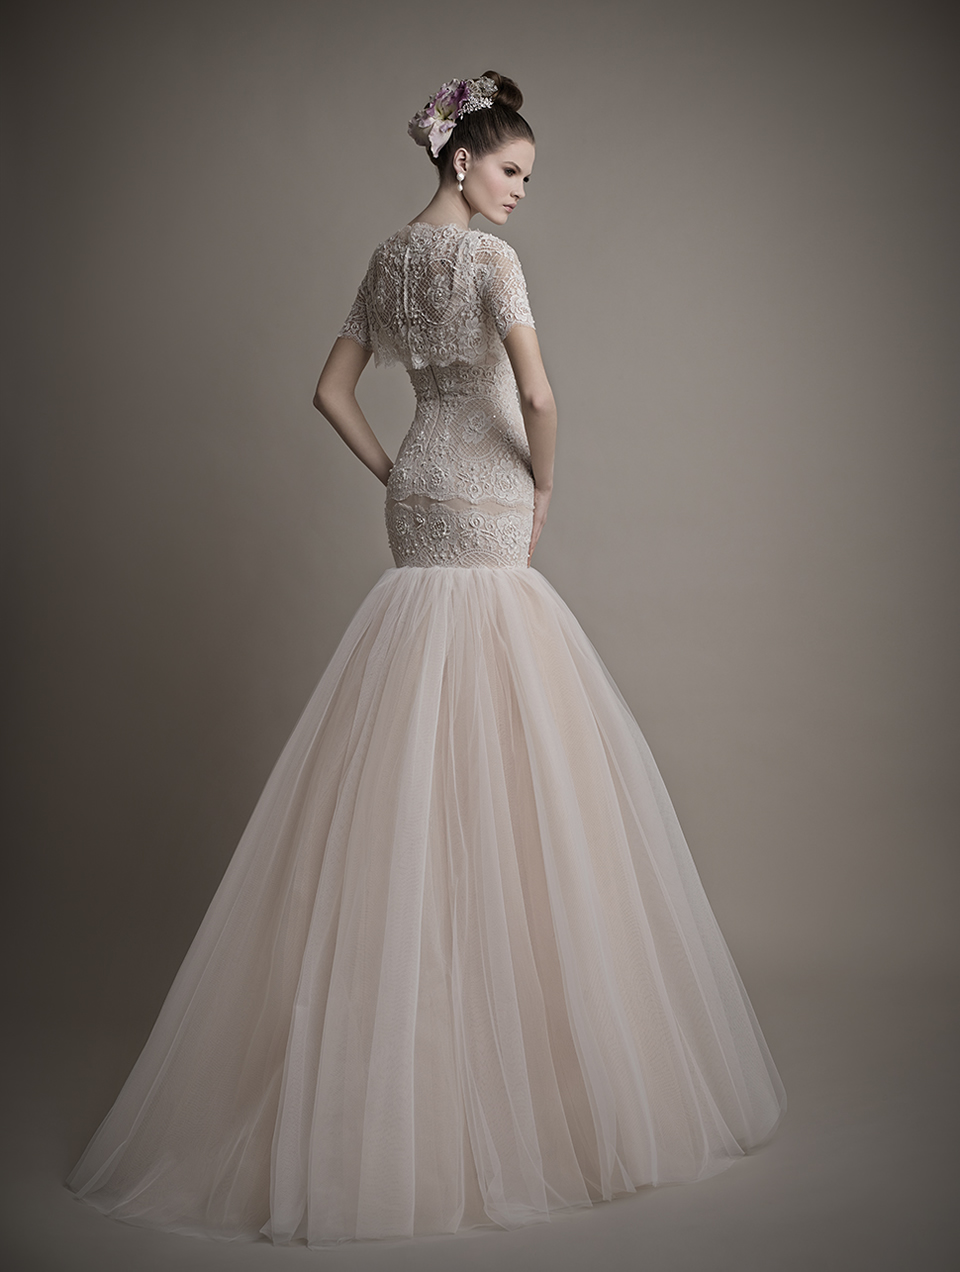 Ersa Atelier's 2015 Bridal Collection - Elizabeth Wedding Dress